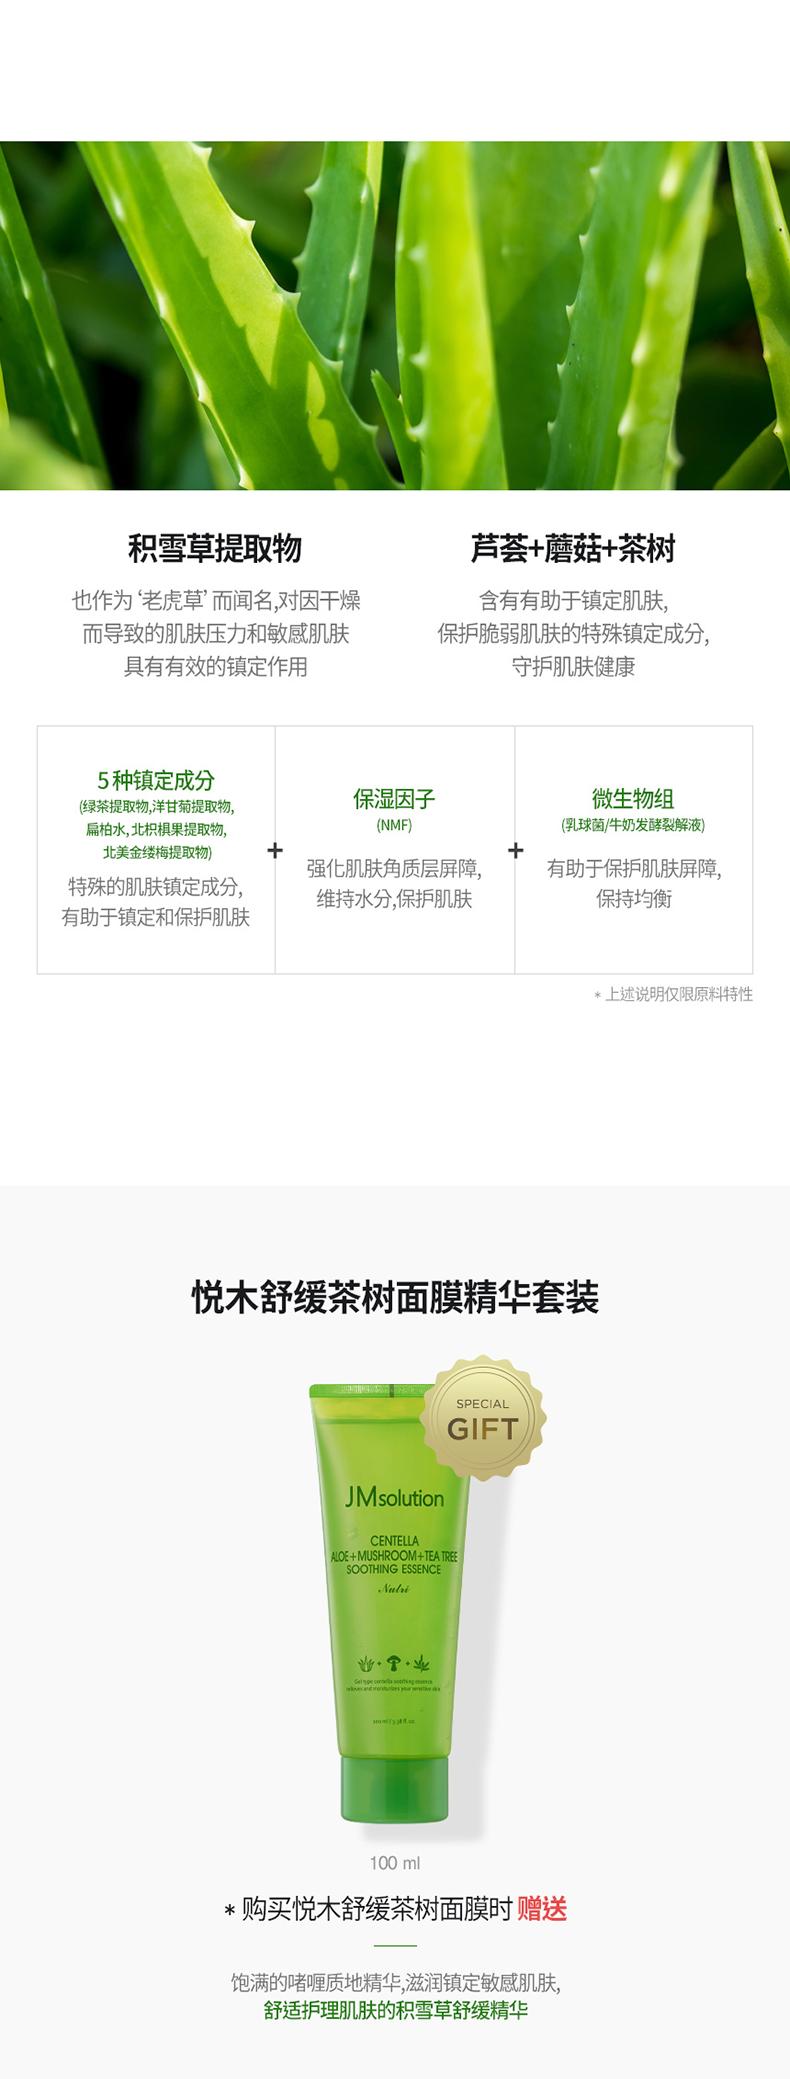 JMsolution Centella Aloe+Mushroom+Tea Tree Mask Nutri Edition 积雪草芦荟茶树镇–  Tao's